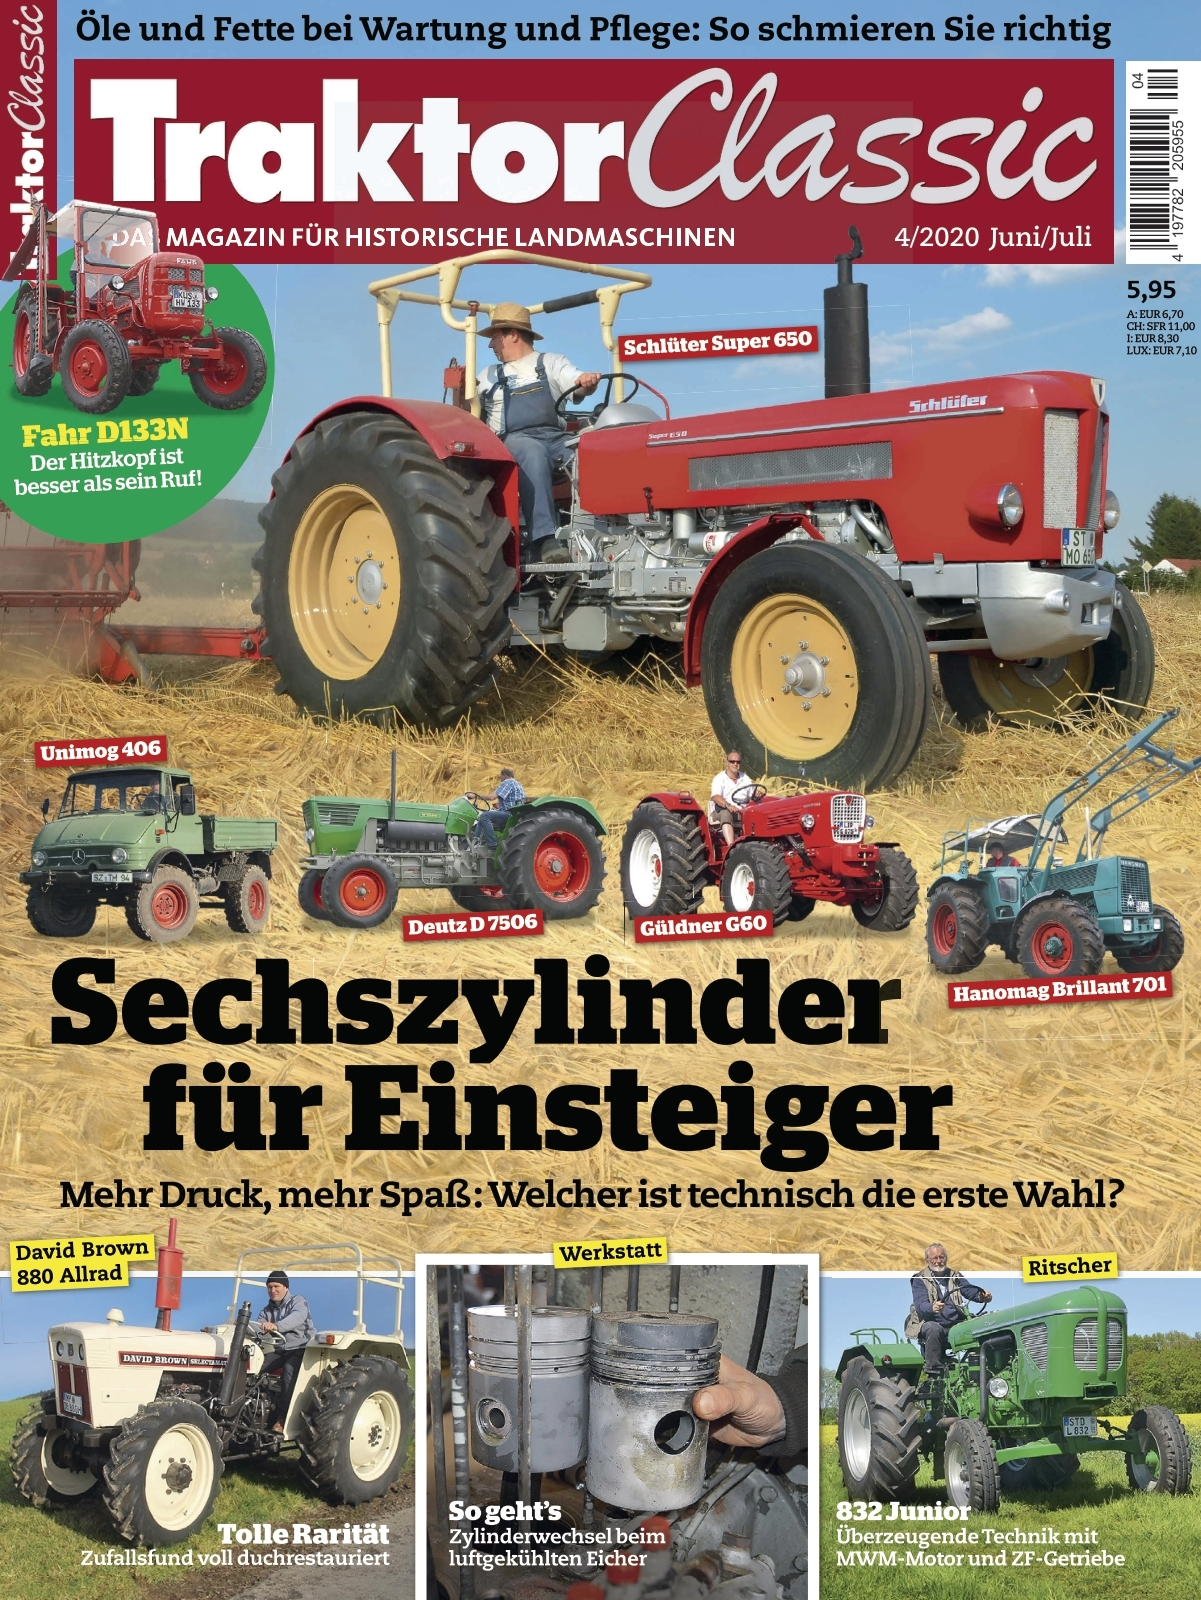 1 Liter Kunstharzlack NEW HOLLAND SCHWARZ TRAKTOR Maschinen LKW NFZ Lack Landmas